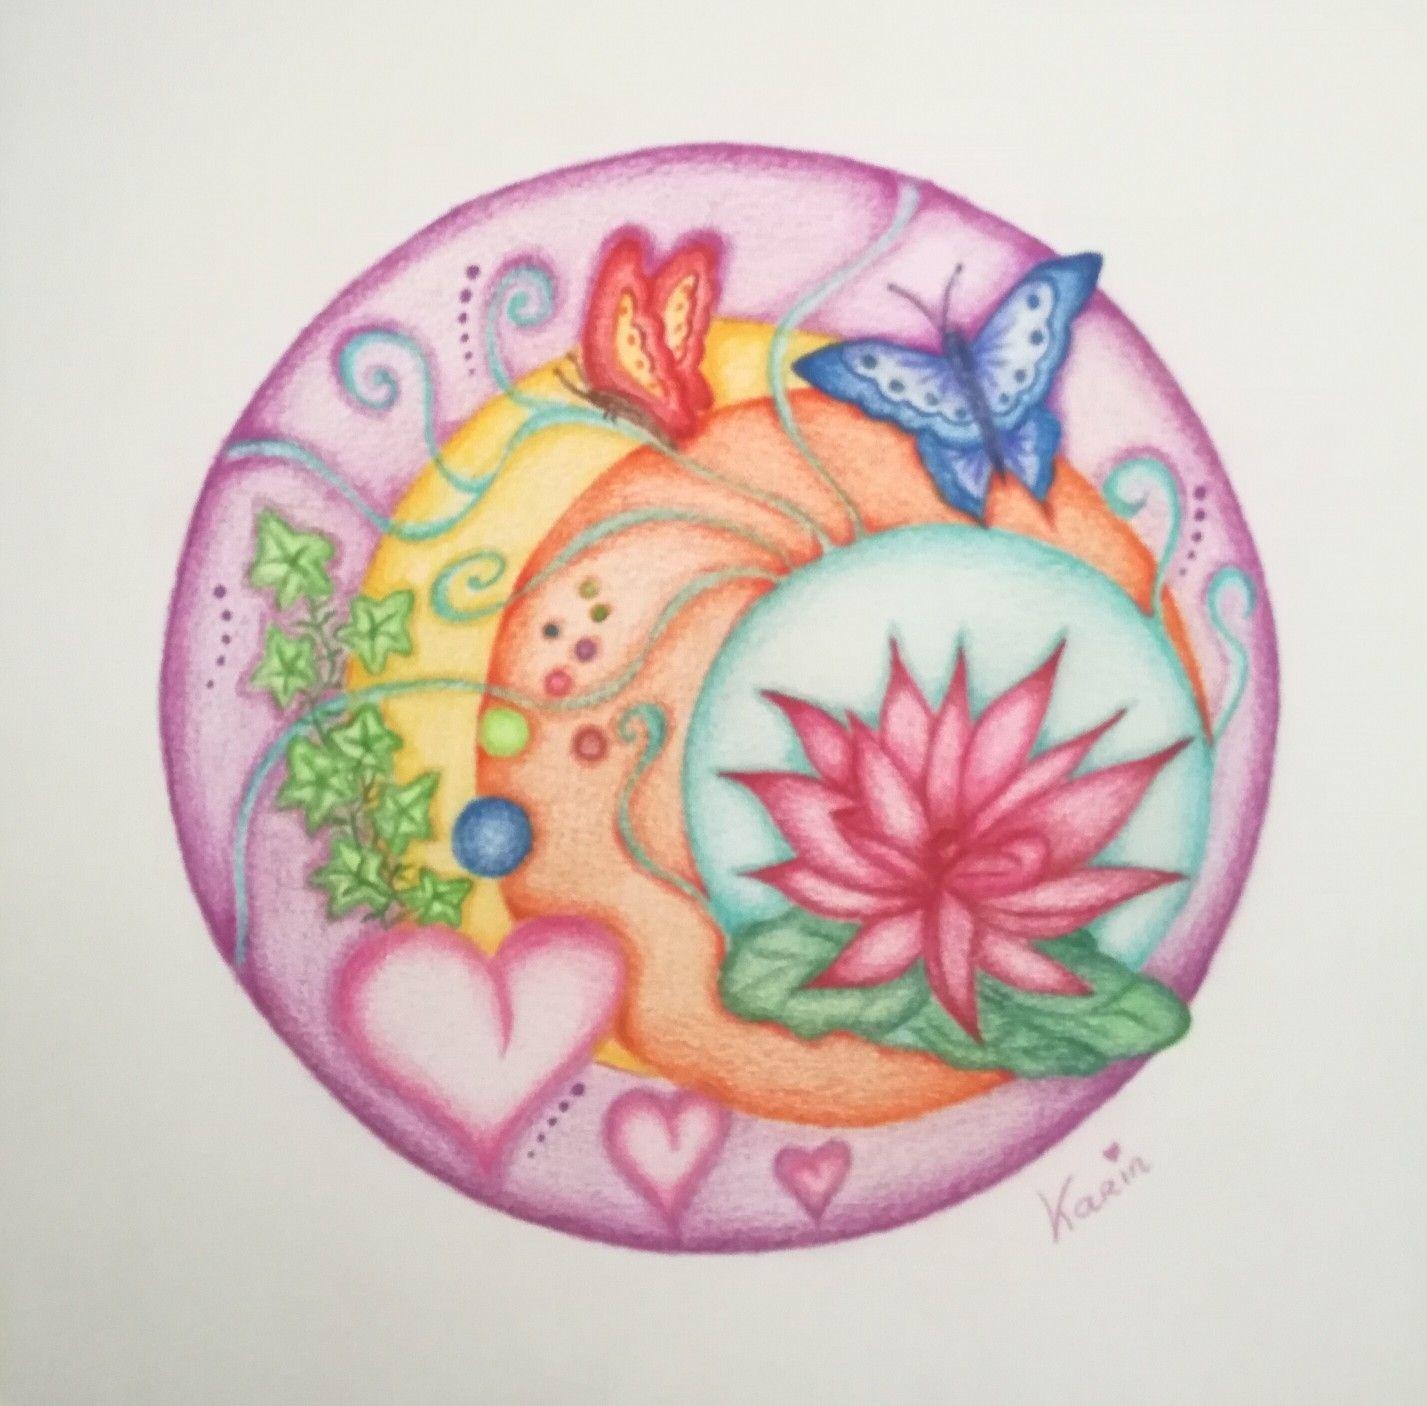 Mandala Ka Inspiratie Www Karinvandelangenberg Nl Mandala Kleurplaten Mandala Tekenen Kleurpotloden